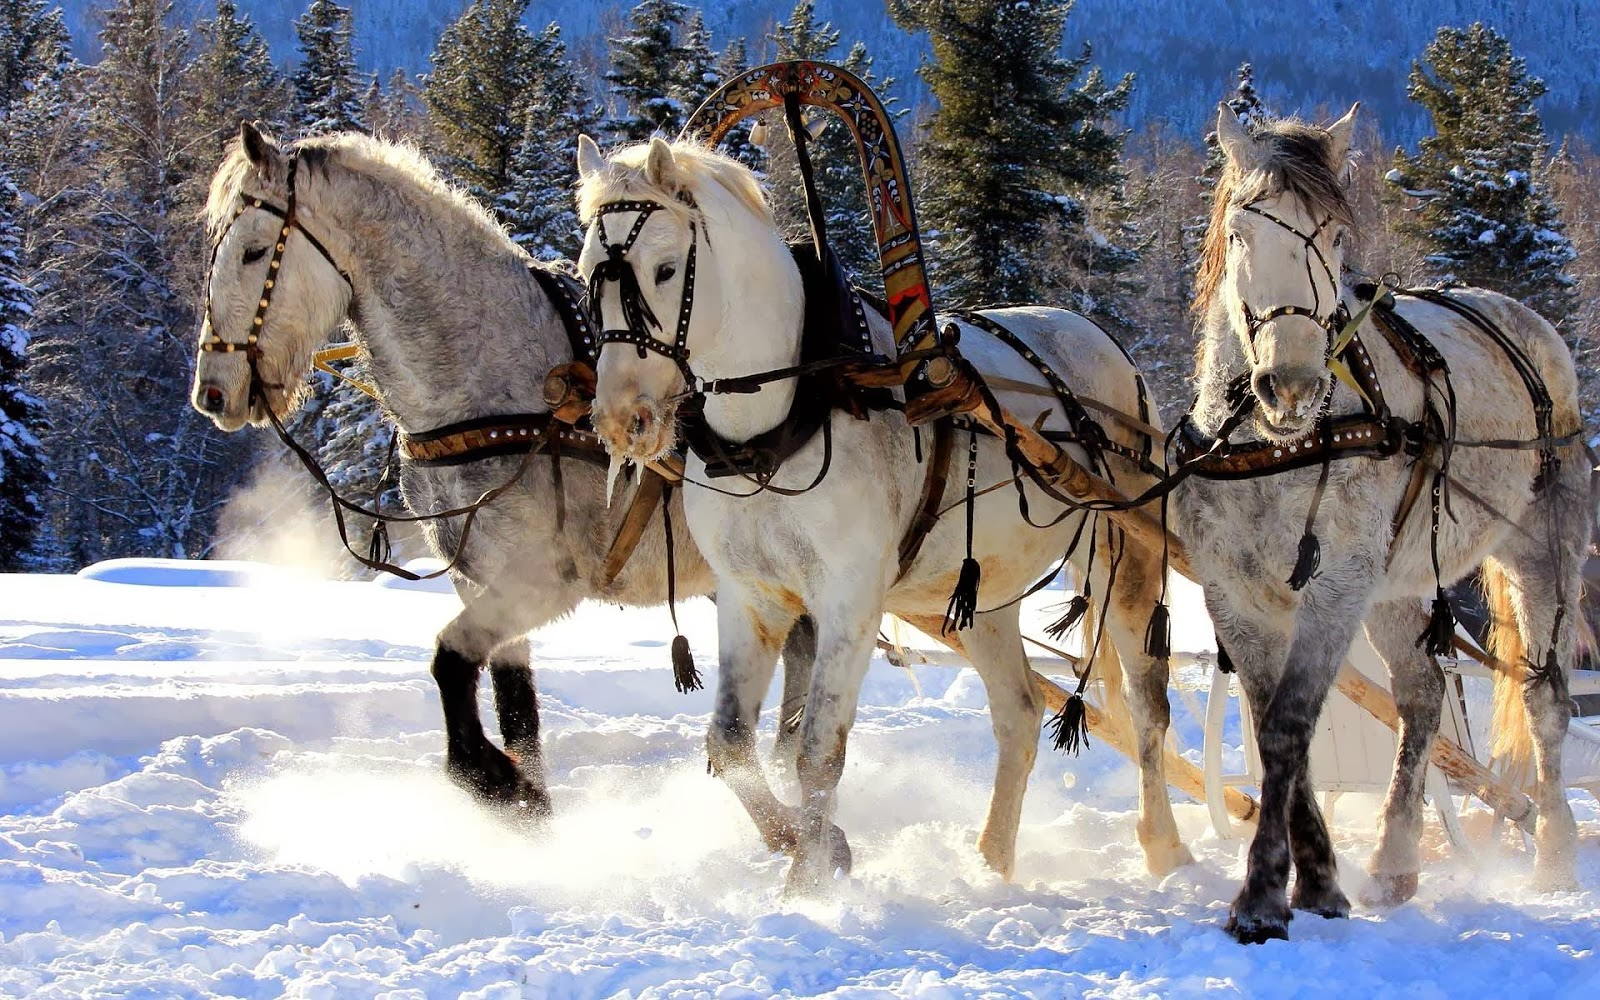 christmas sleigh horses 1920x1080 wallpaper - photo #43